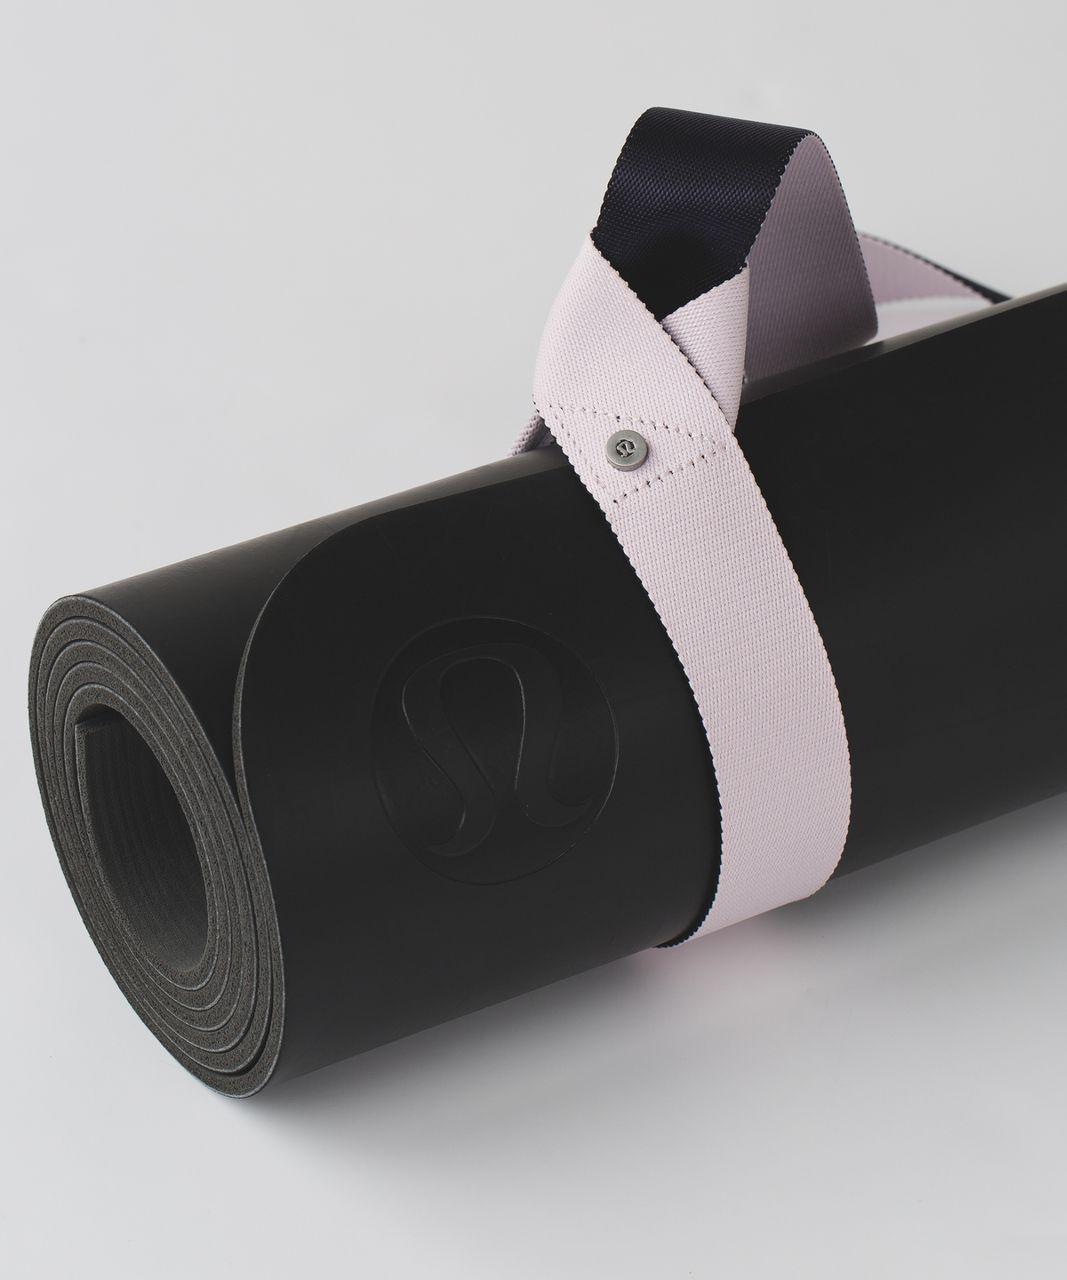 Lululemon Loop It Up Mat Strap - Black Grape / Powdered Rose